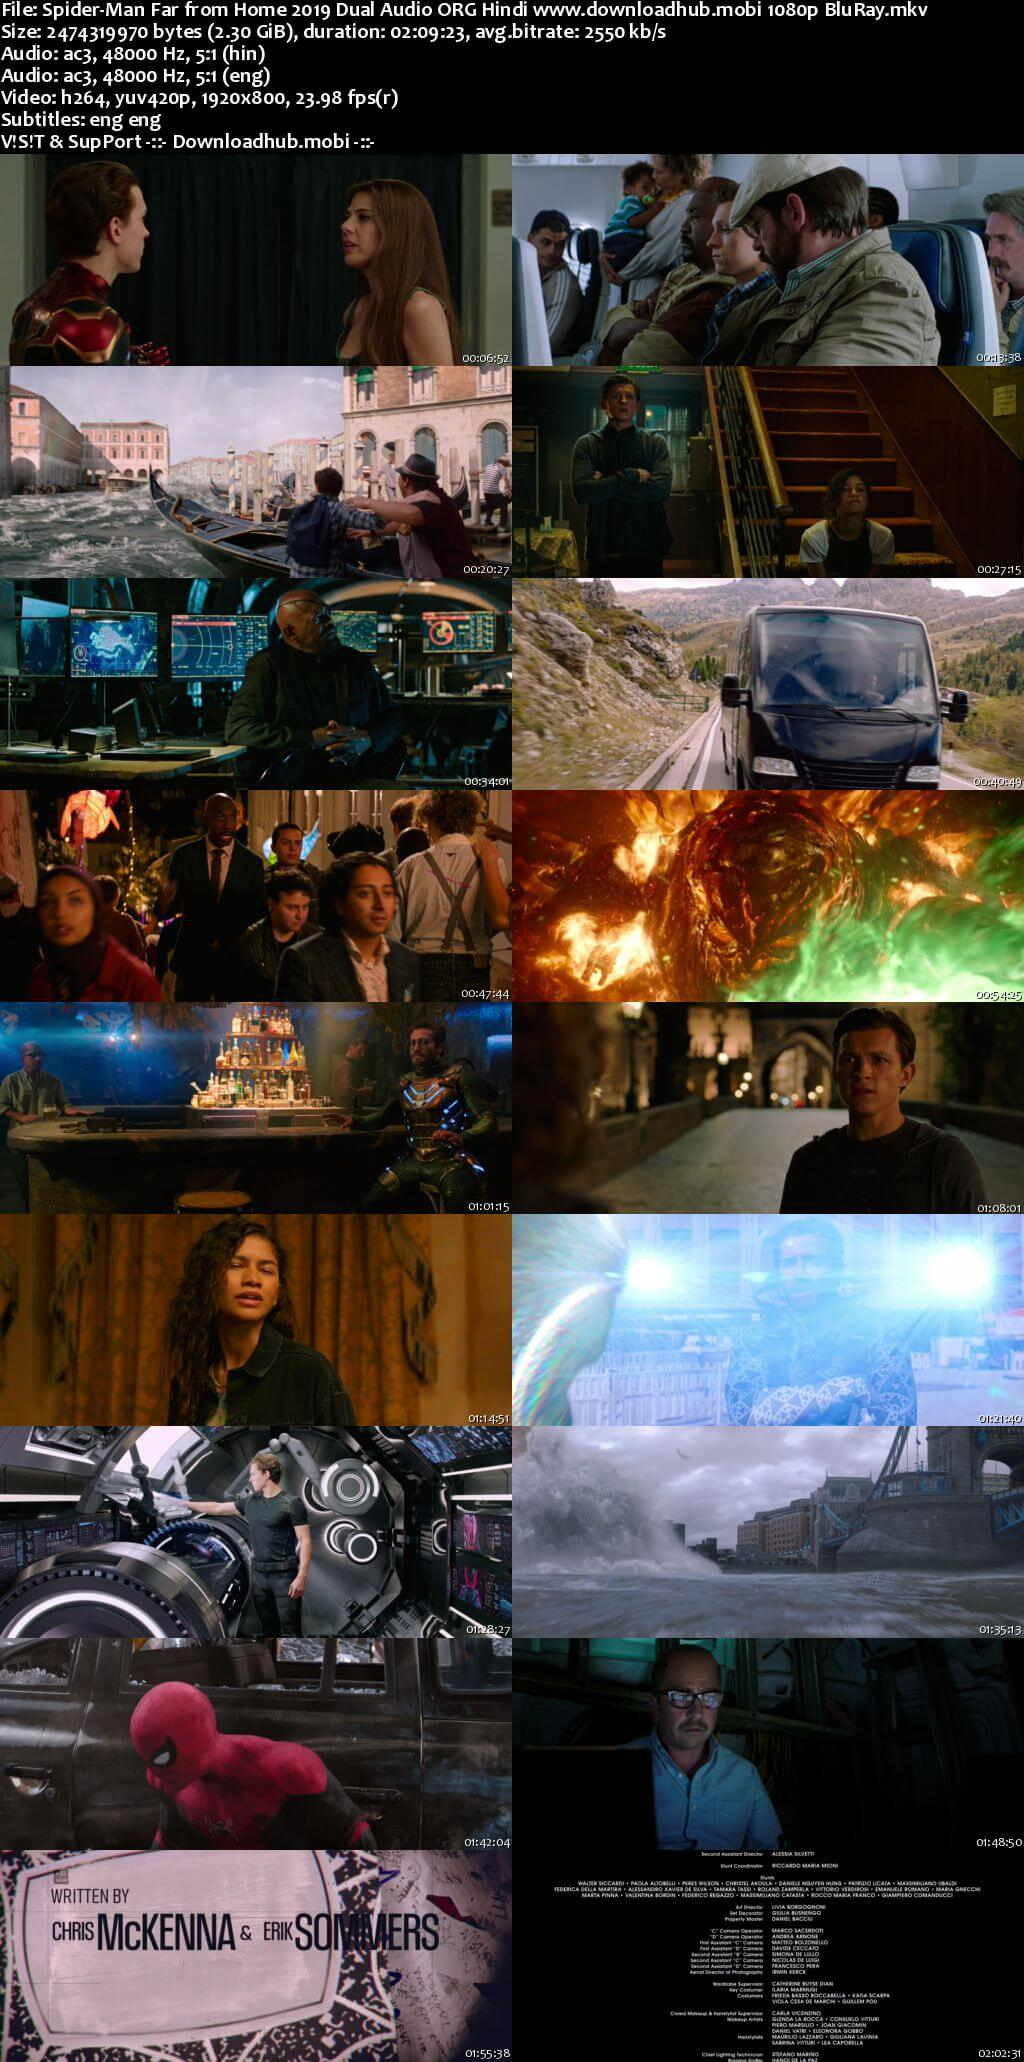 Spider Man Far from Home 2019 Hindi ORG Dual Audio 1080p BluRay ESubs